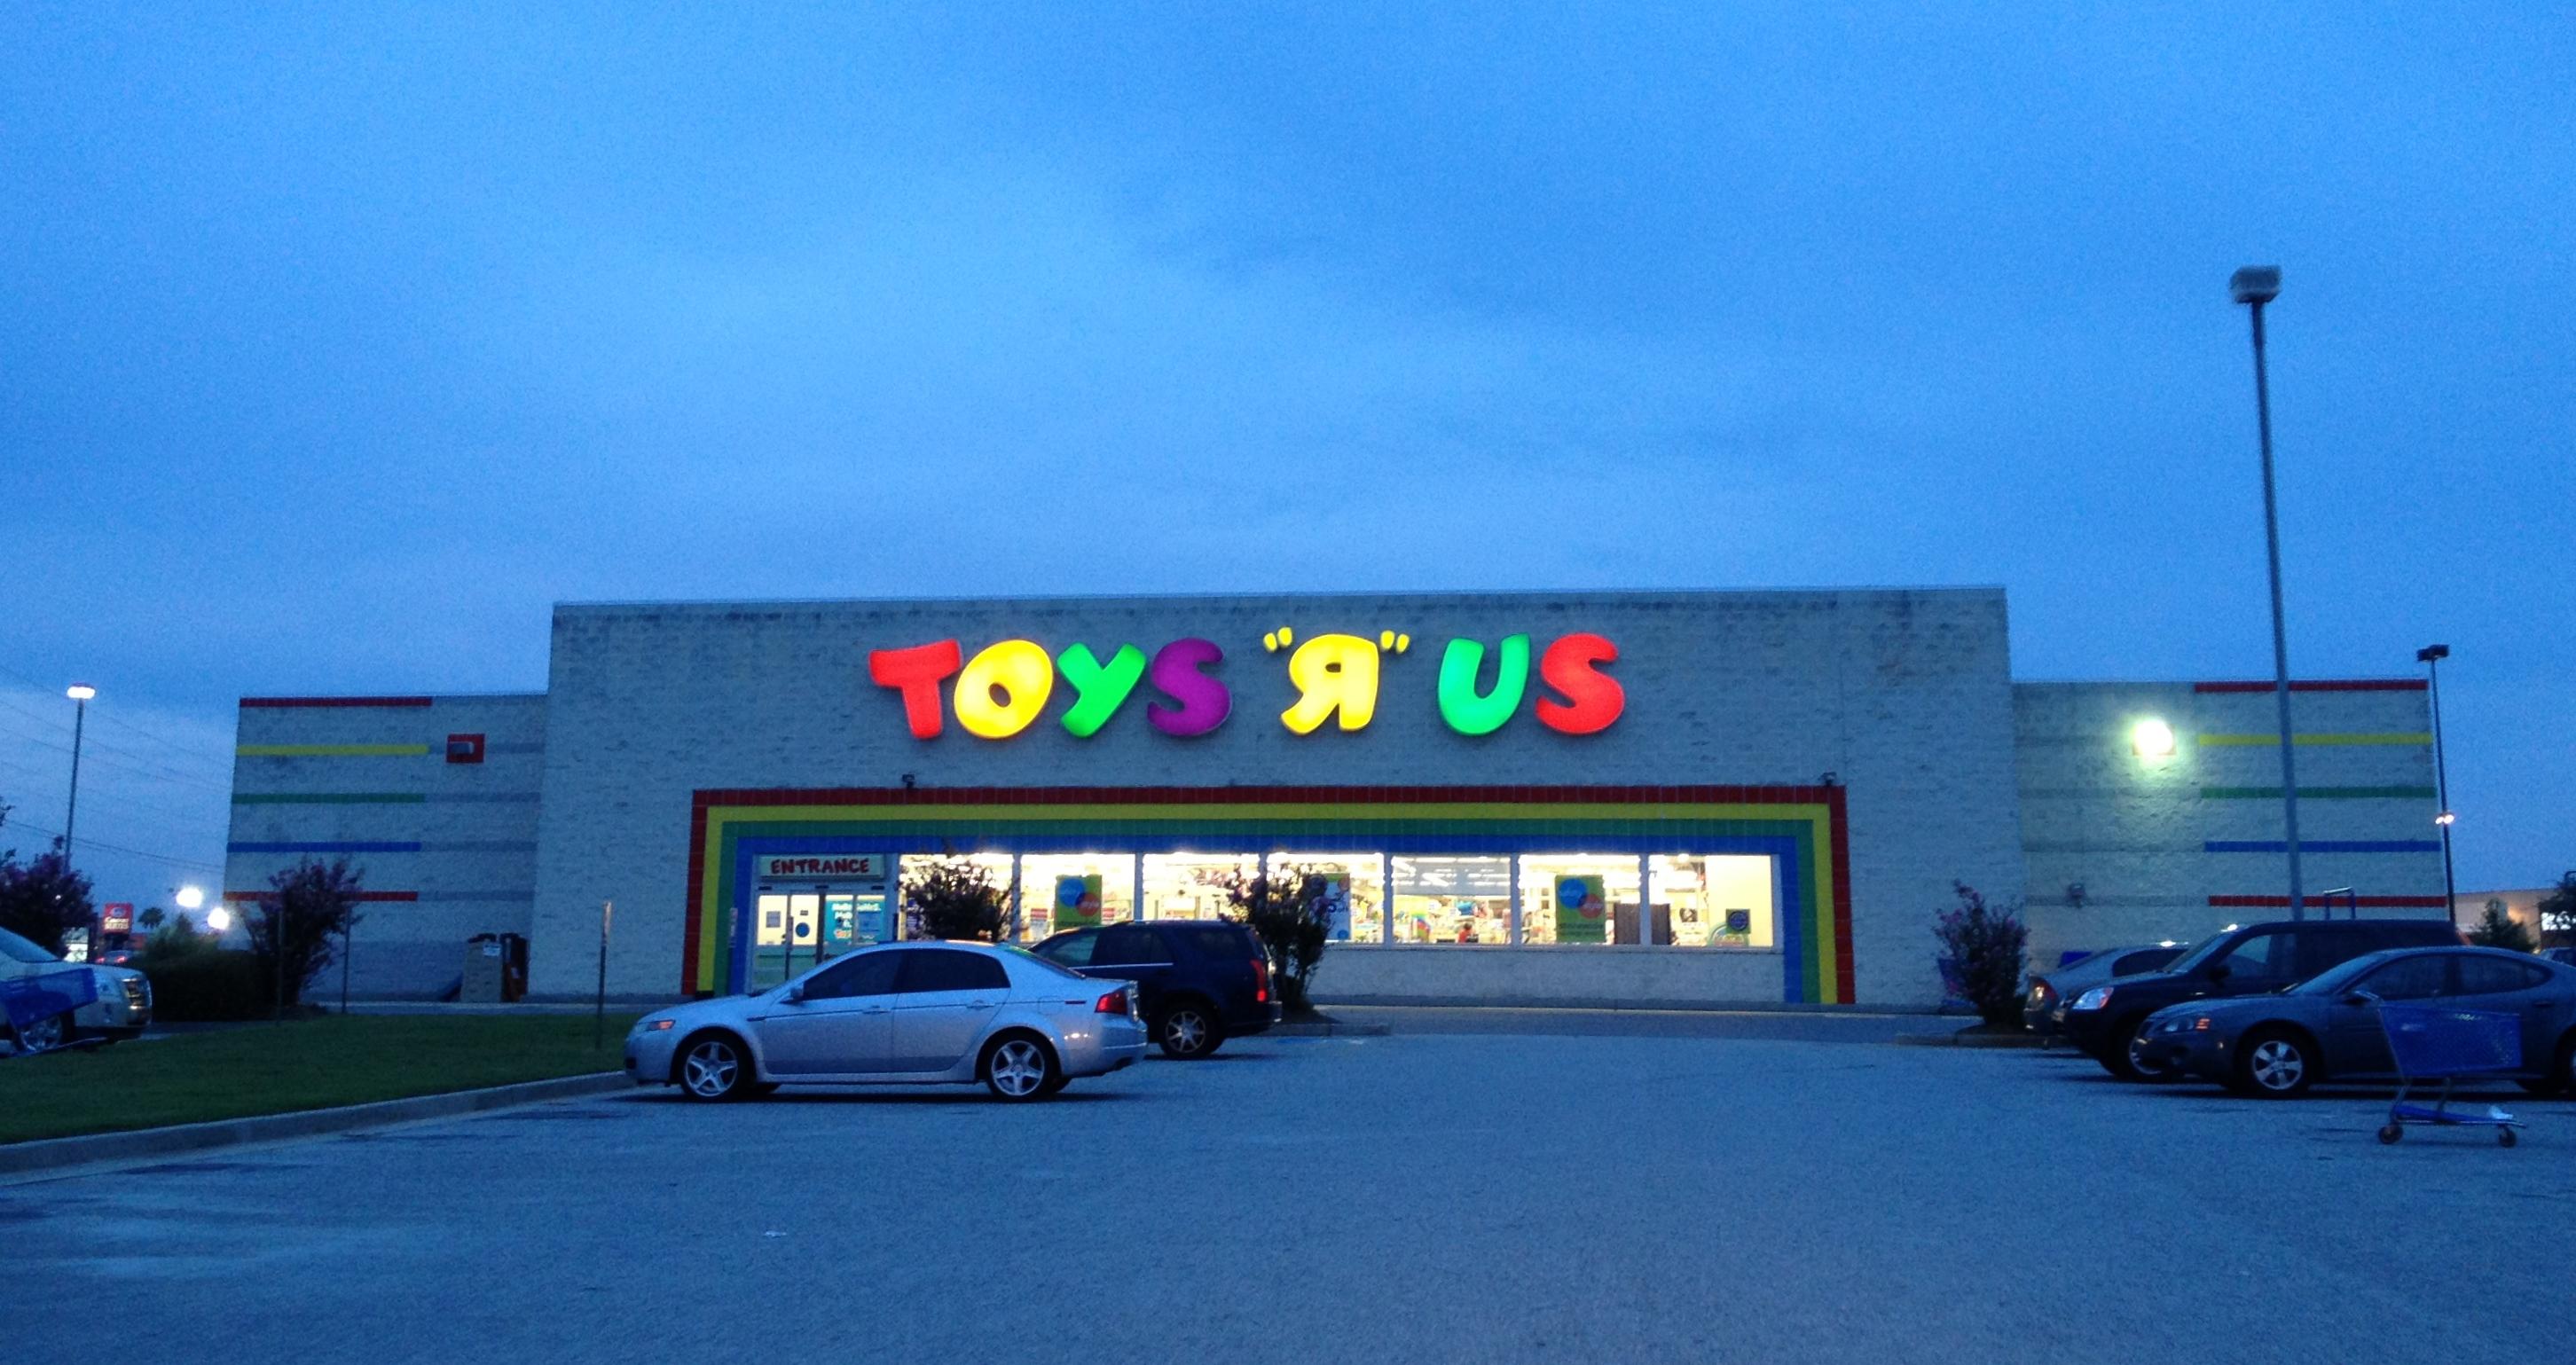 Jun 30, · Toys R Us (ToysRUs) Founded. USA: as Children's Discount Supermarts (Children's Supermart) as Toys